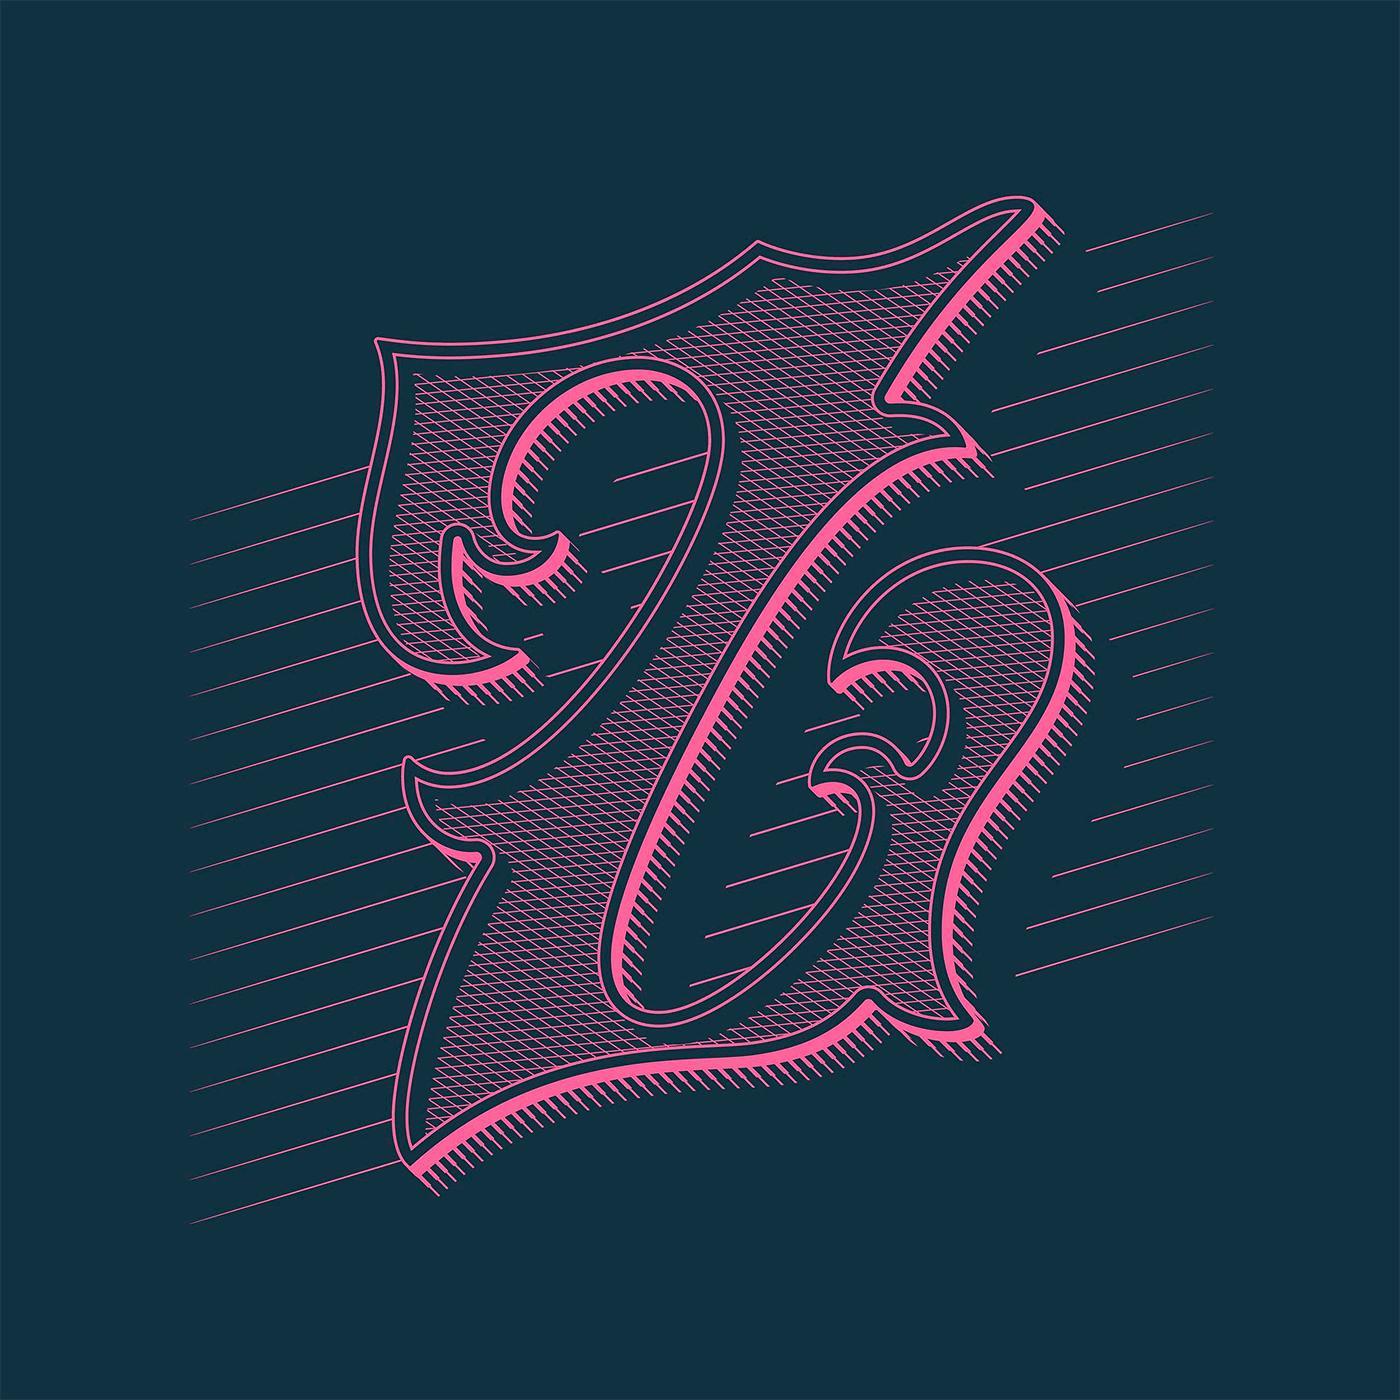 Dan Forster创意字体设计